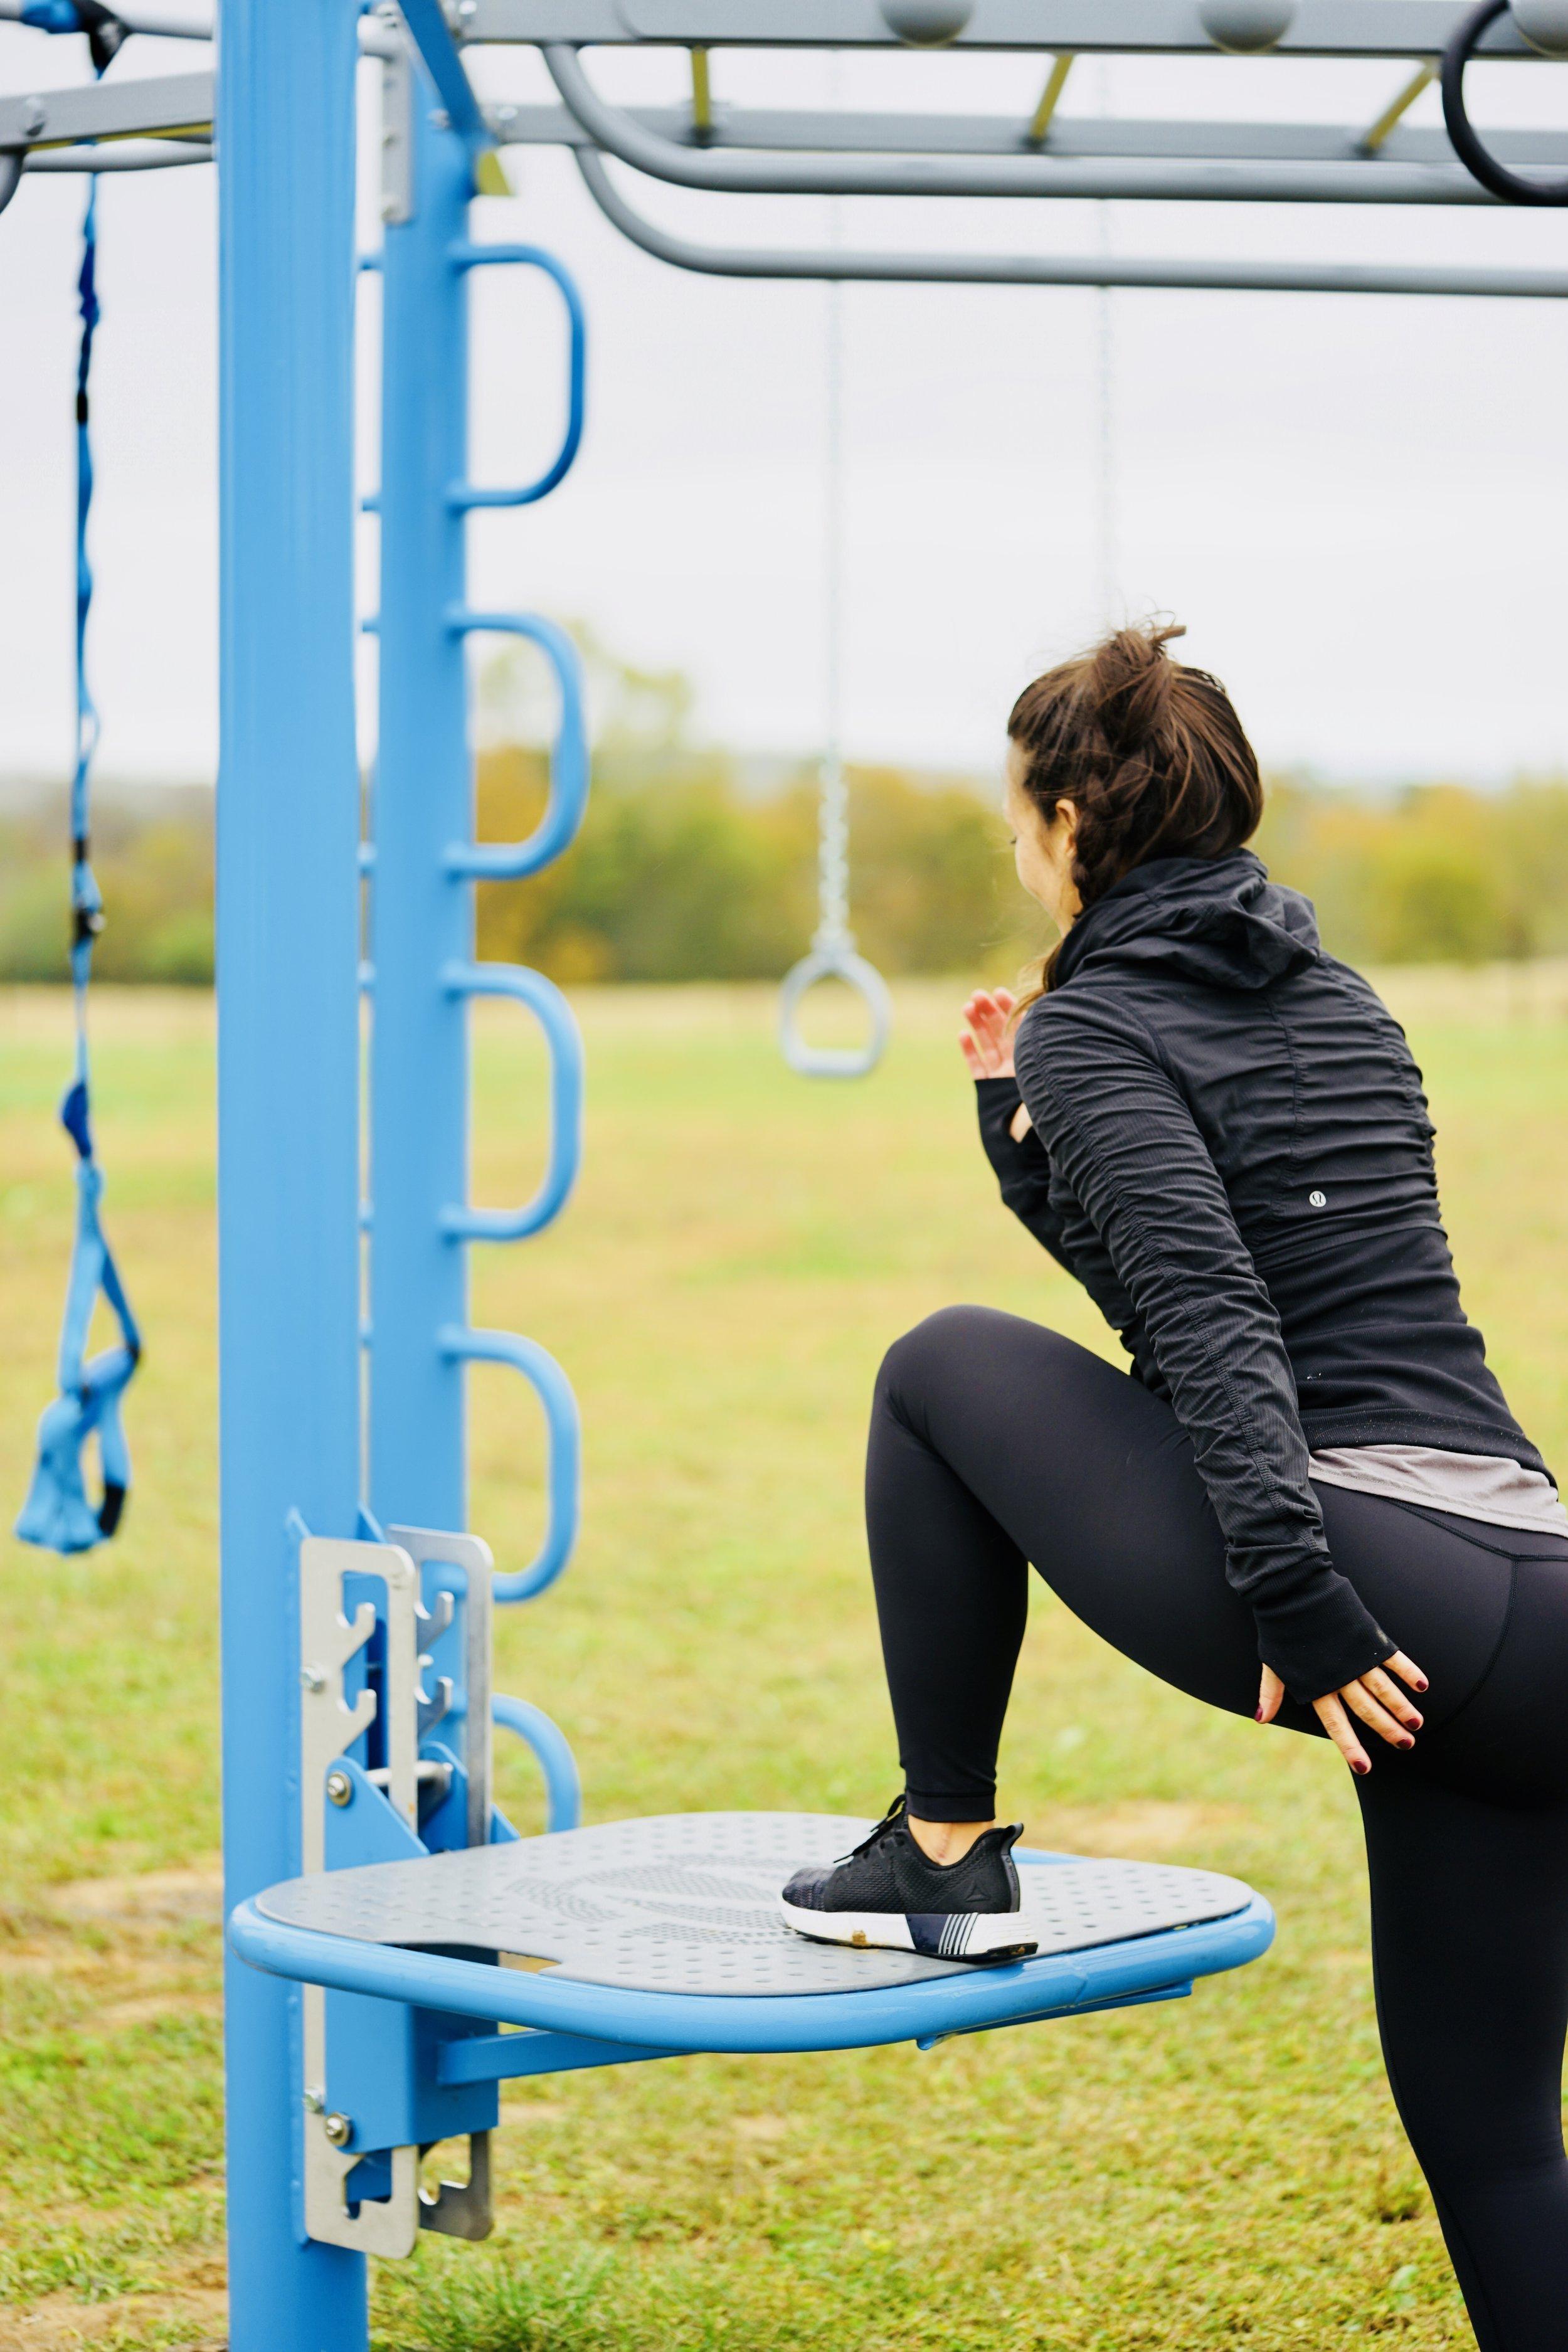 Adjustable Step Up Outdoor Fitness Equipment